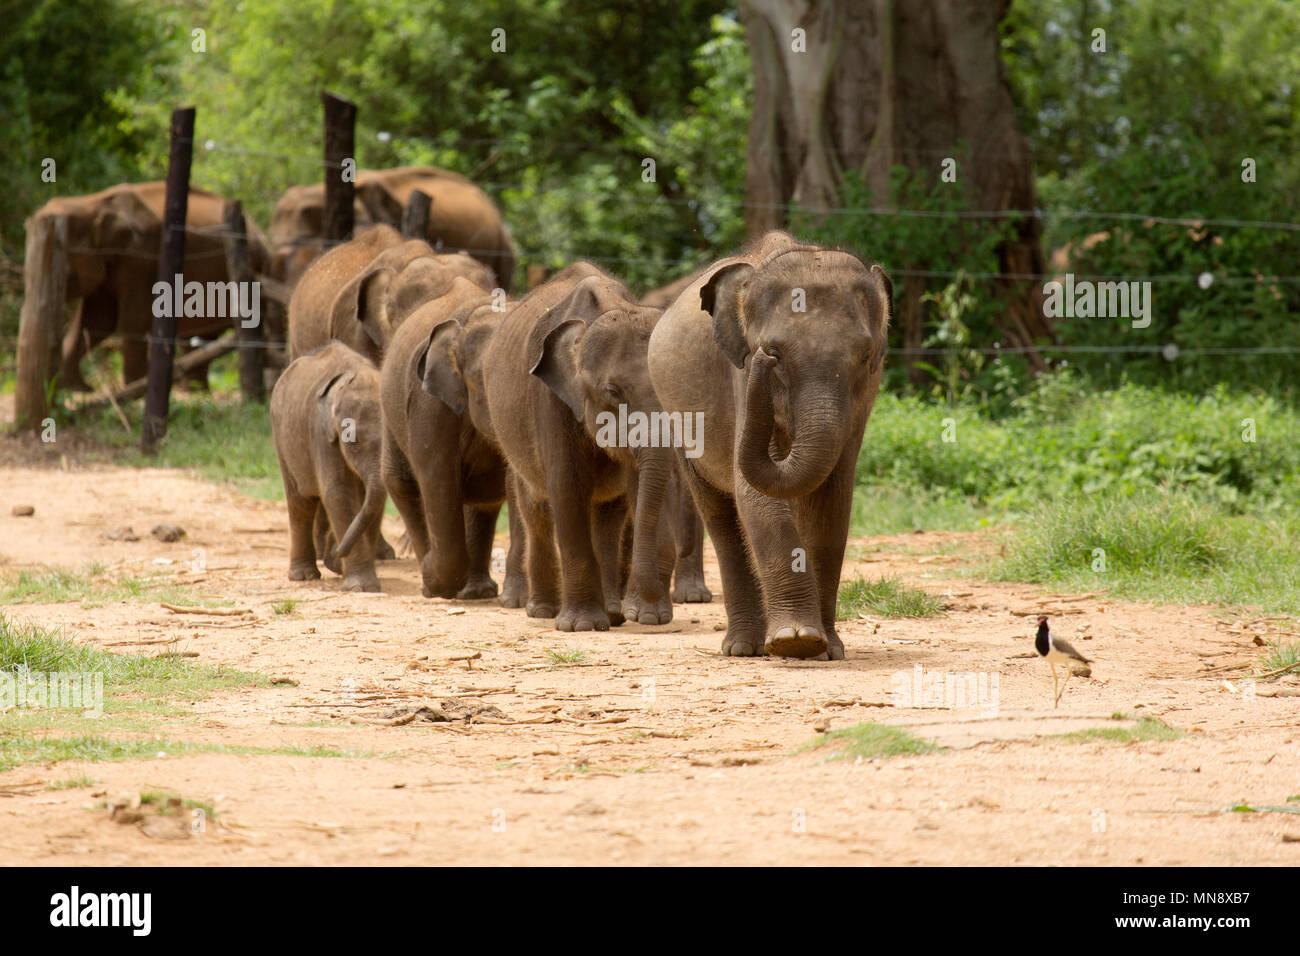 Elefanten füttern am Udwawalawe Elephant Transit zu Hause Uwawalawe Nationalpark in Sri Lanka. Stockbild